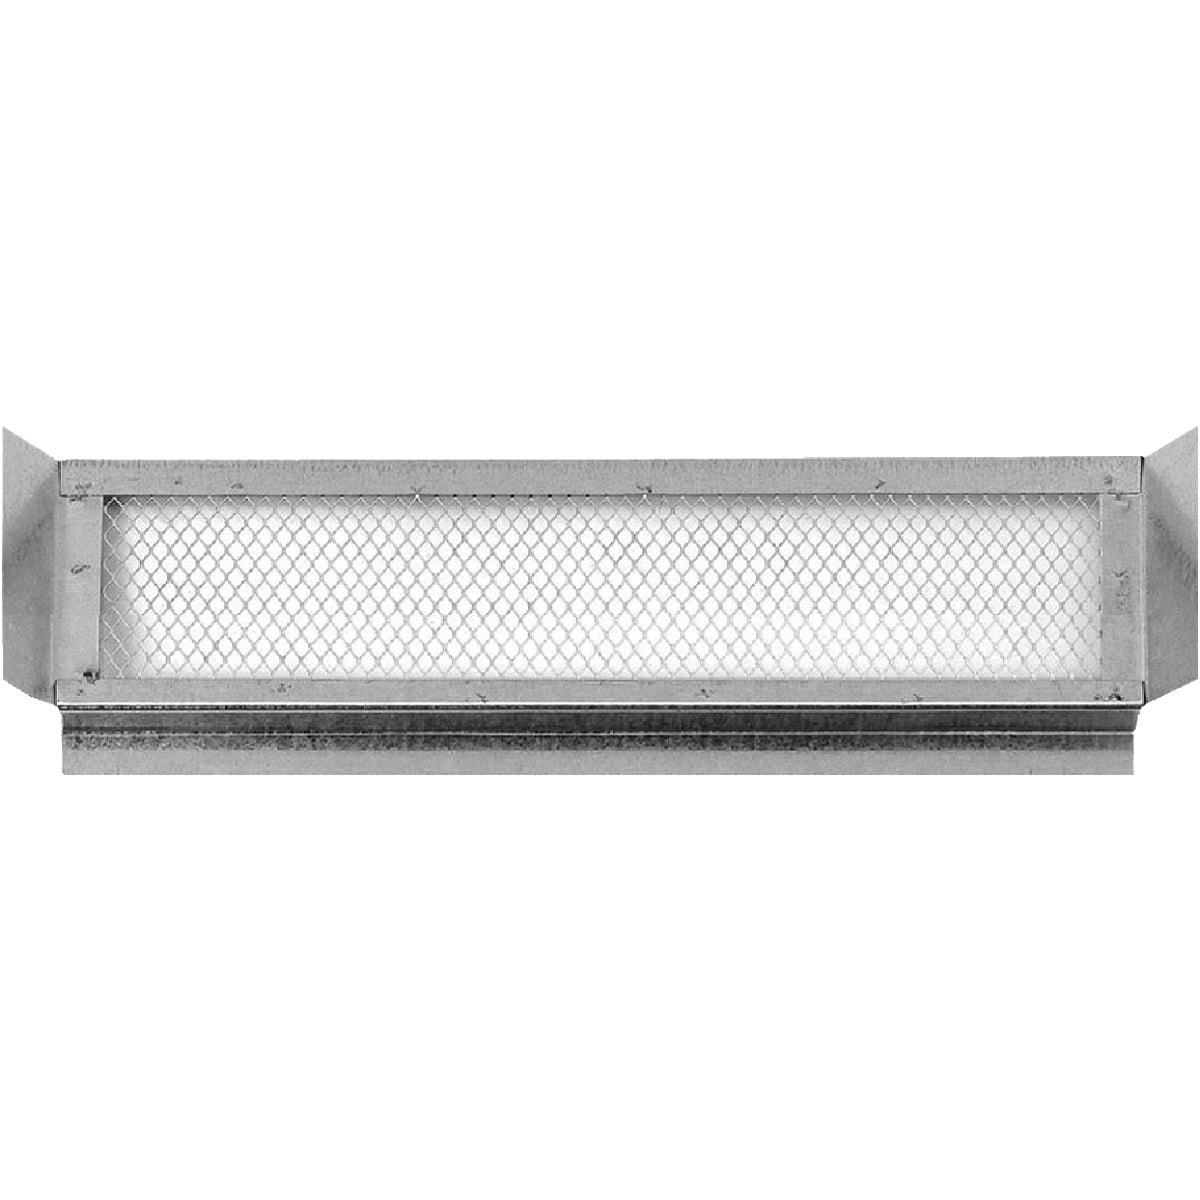 NorWesco Eave Ventilator, 556177